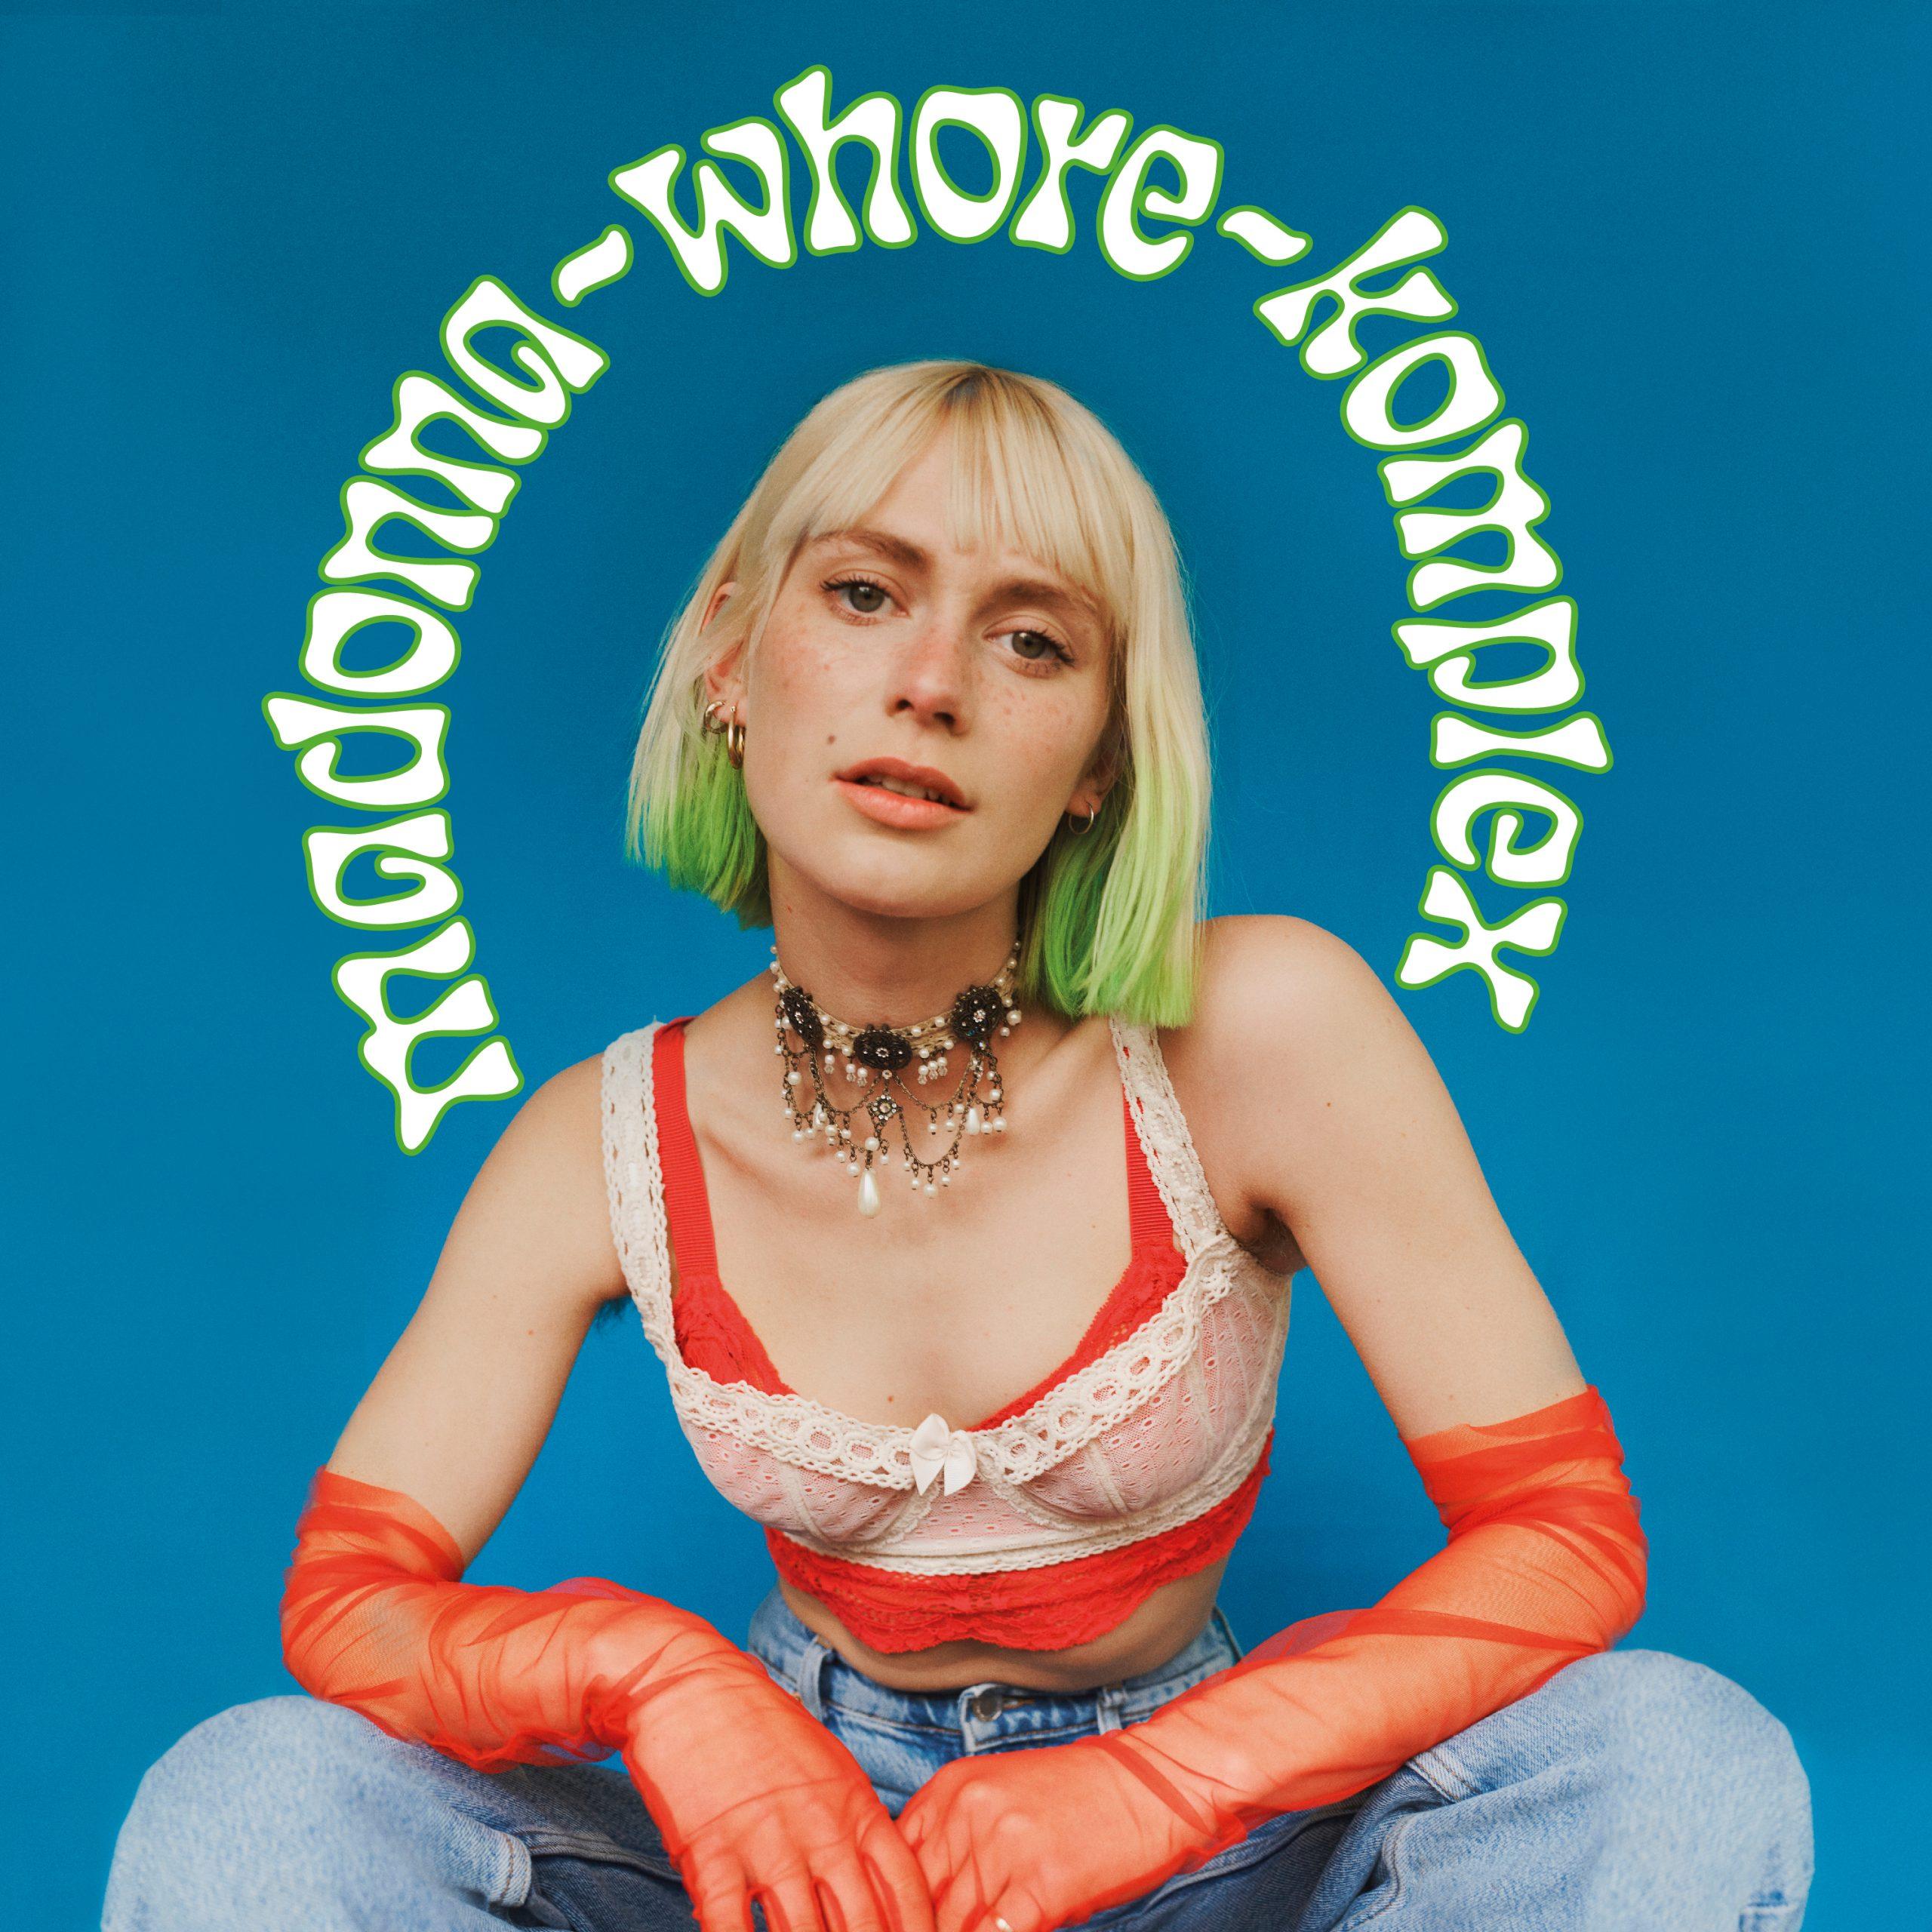 Madonna Whore Komplex (Single)